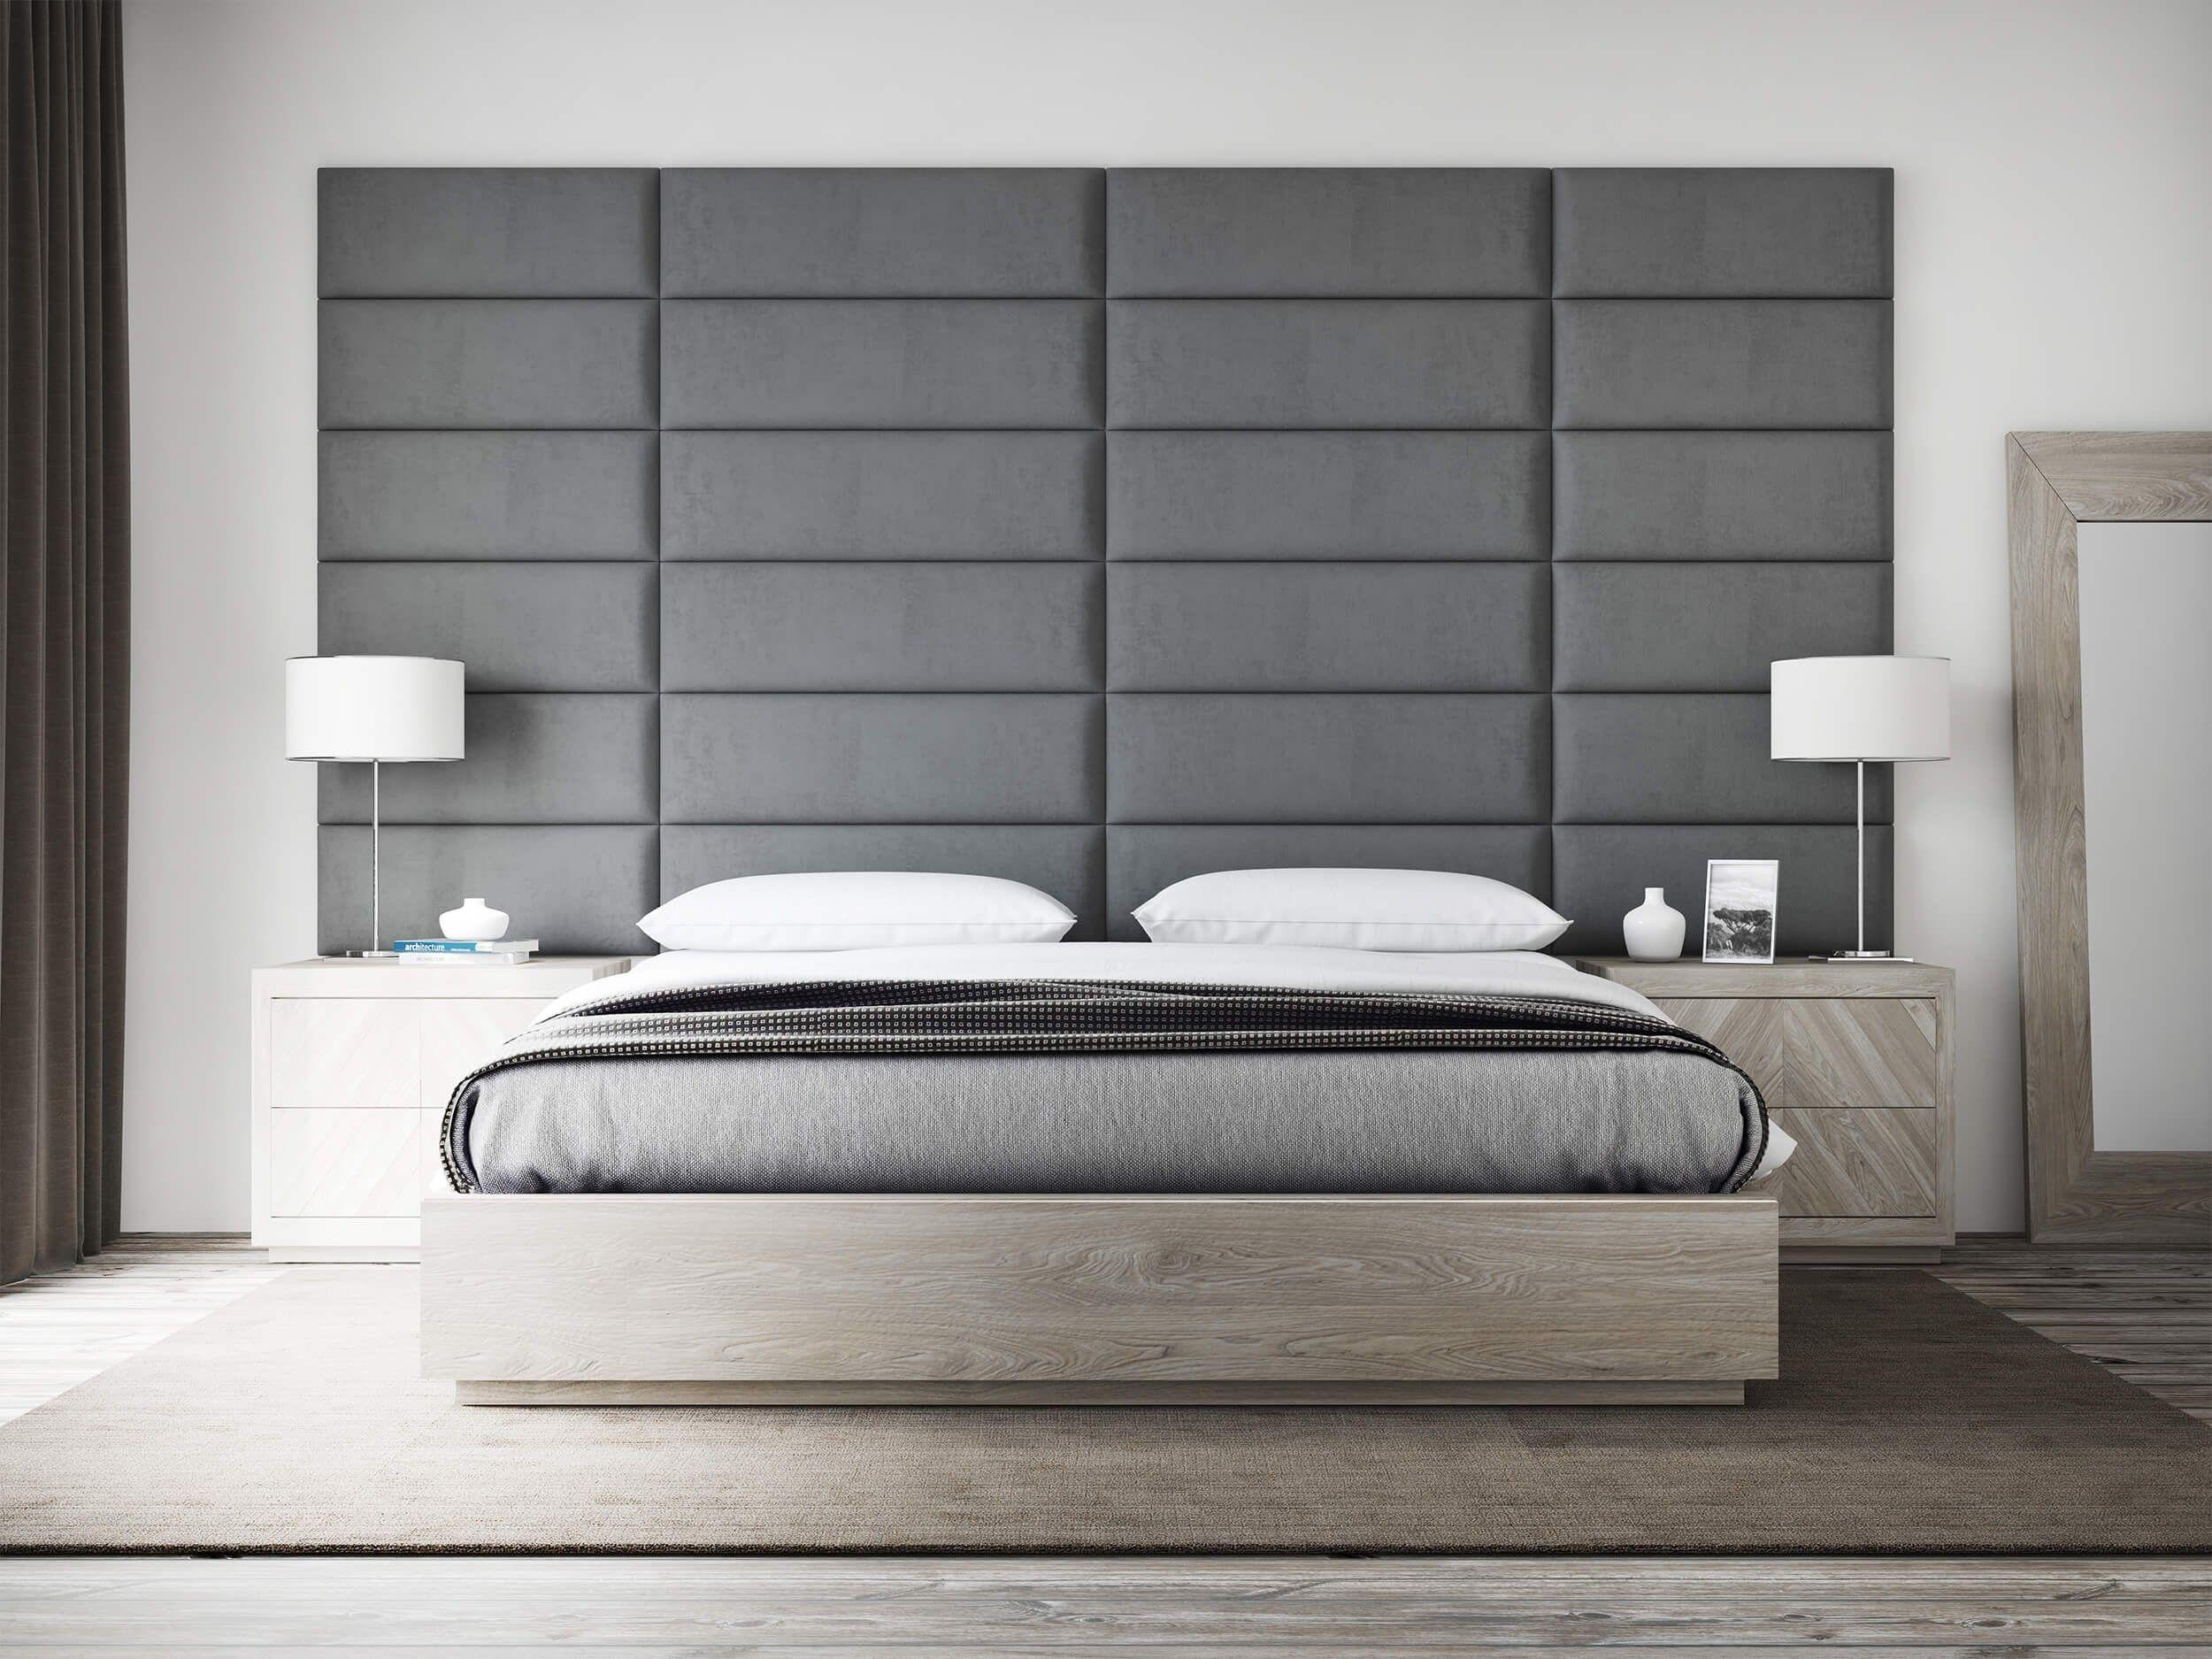 Vänt's Most Popular Layouts Upholstered walls